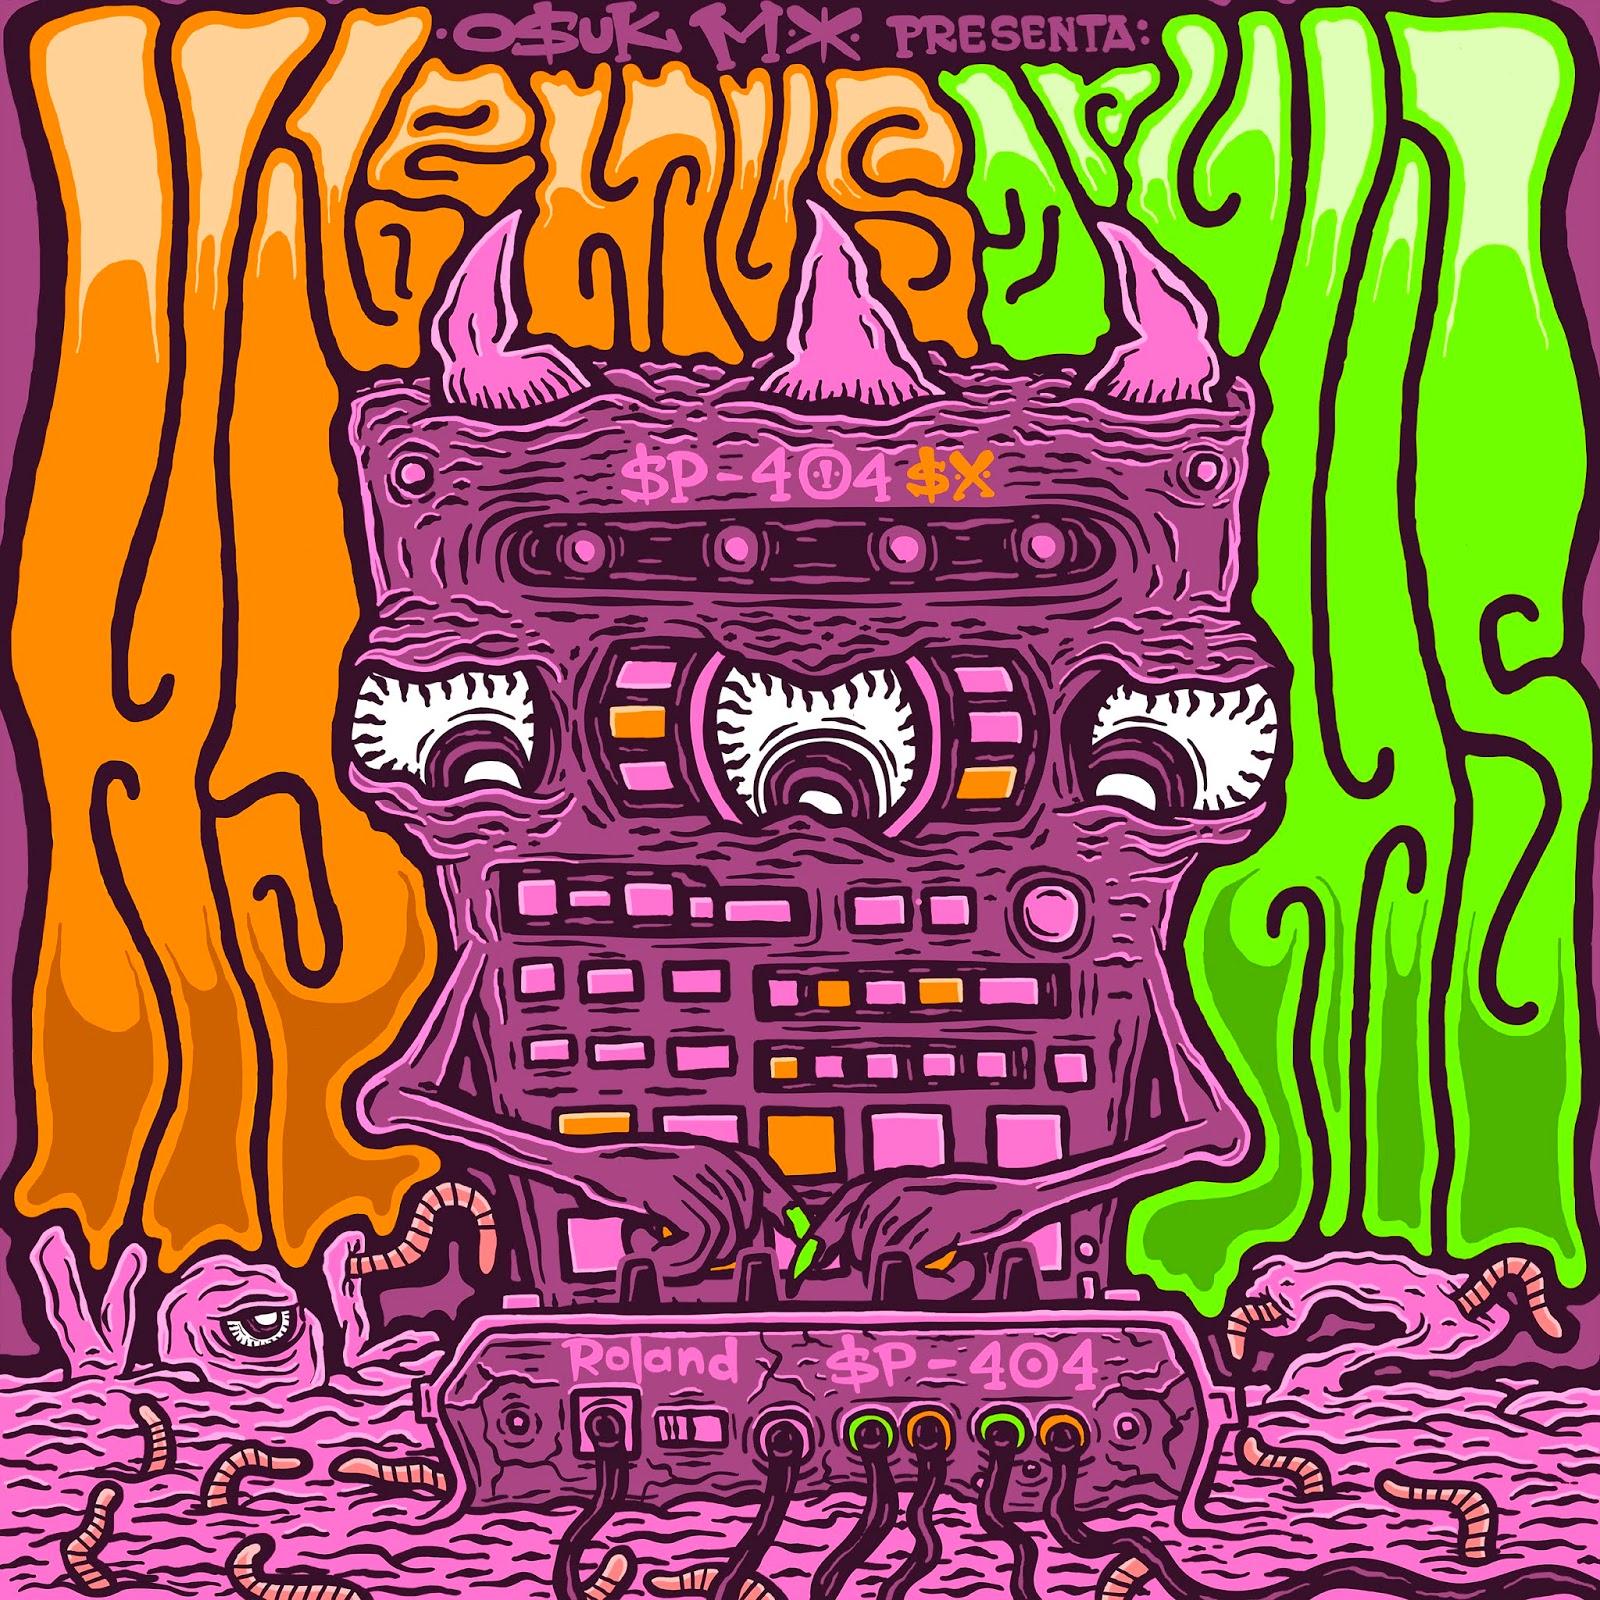 Habemus Drums Vol. 2